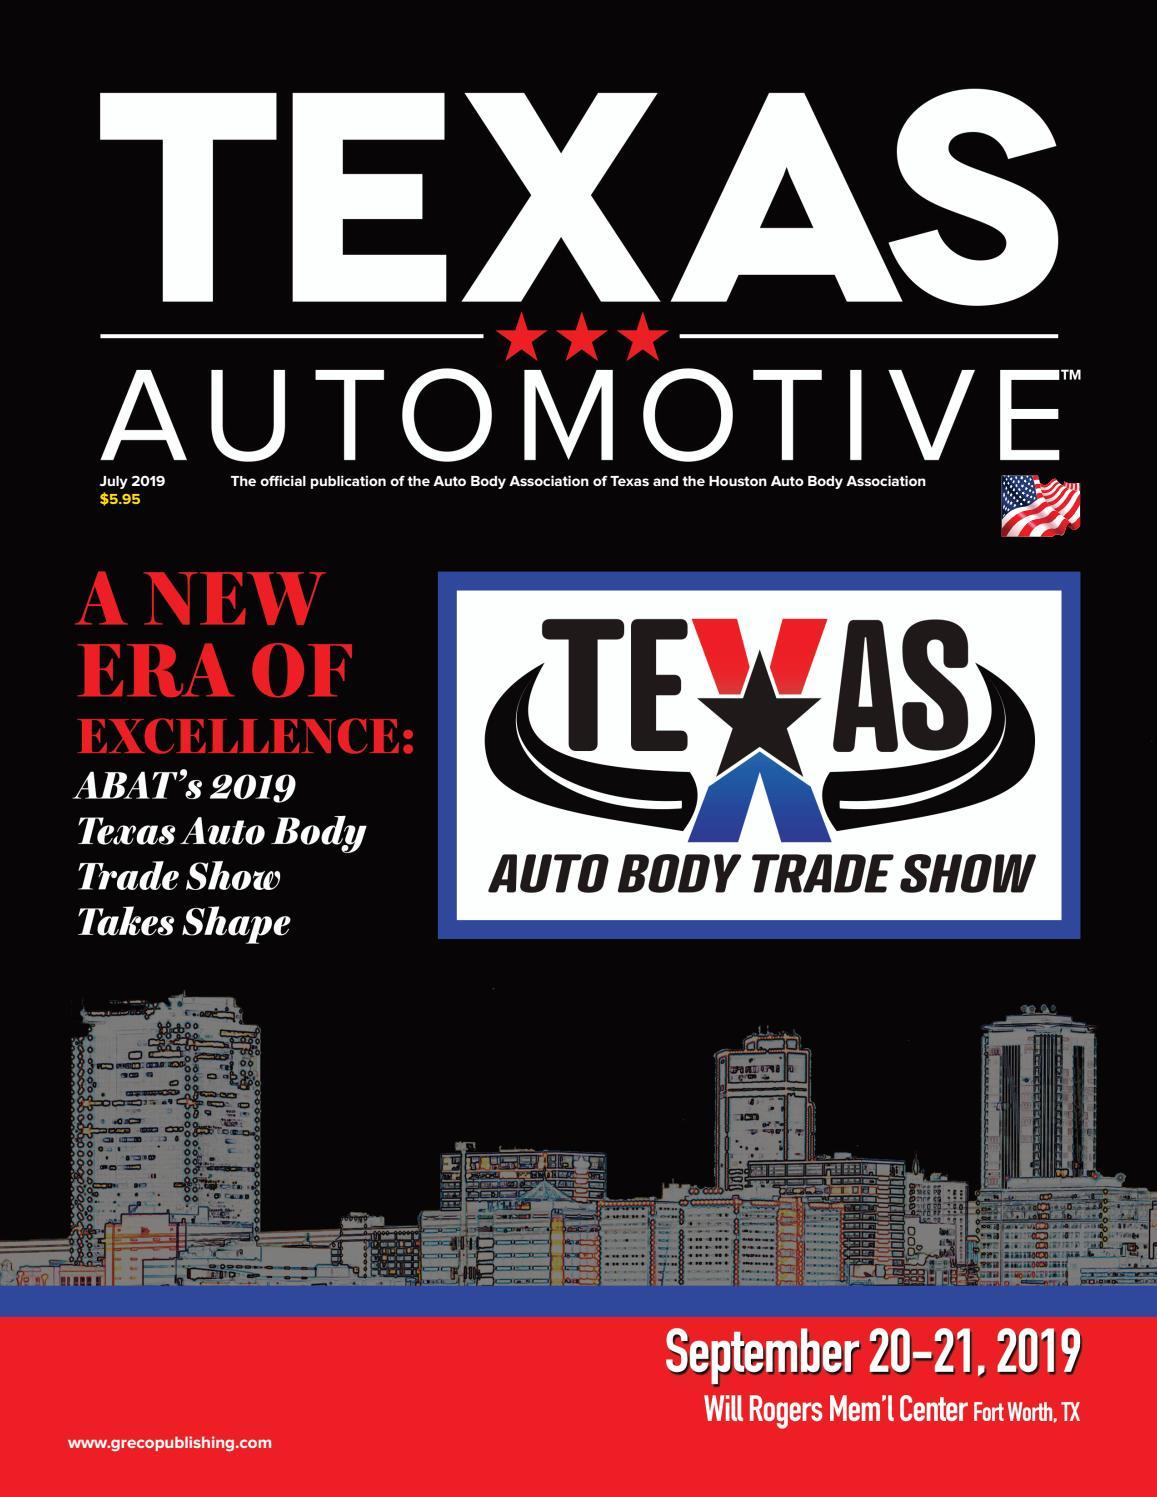 Texas Automotive July 2019 by Thomas Greco Publishing, Inc